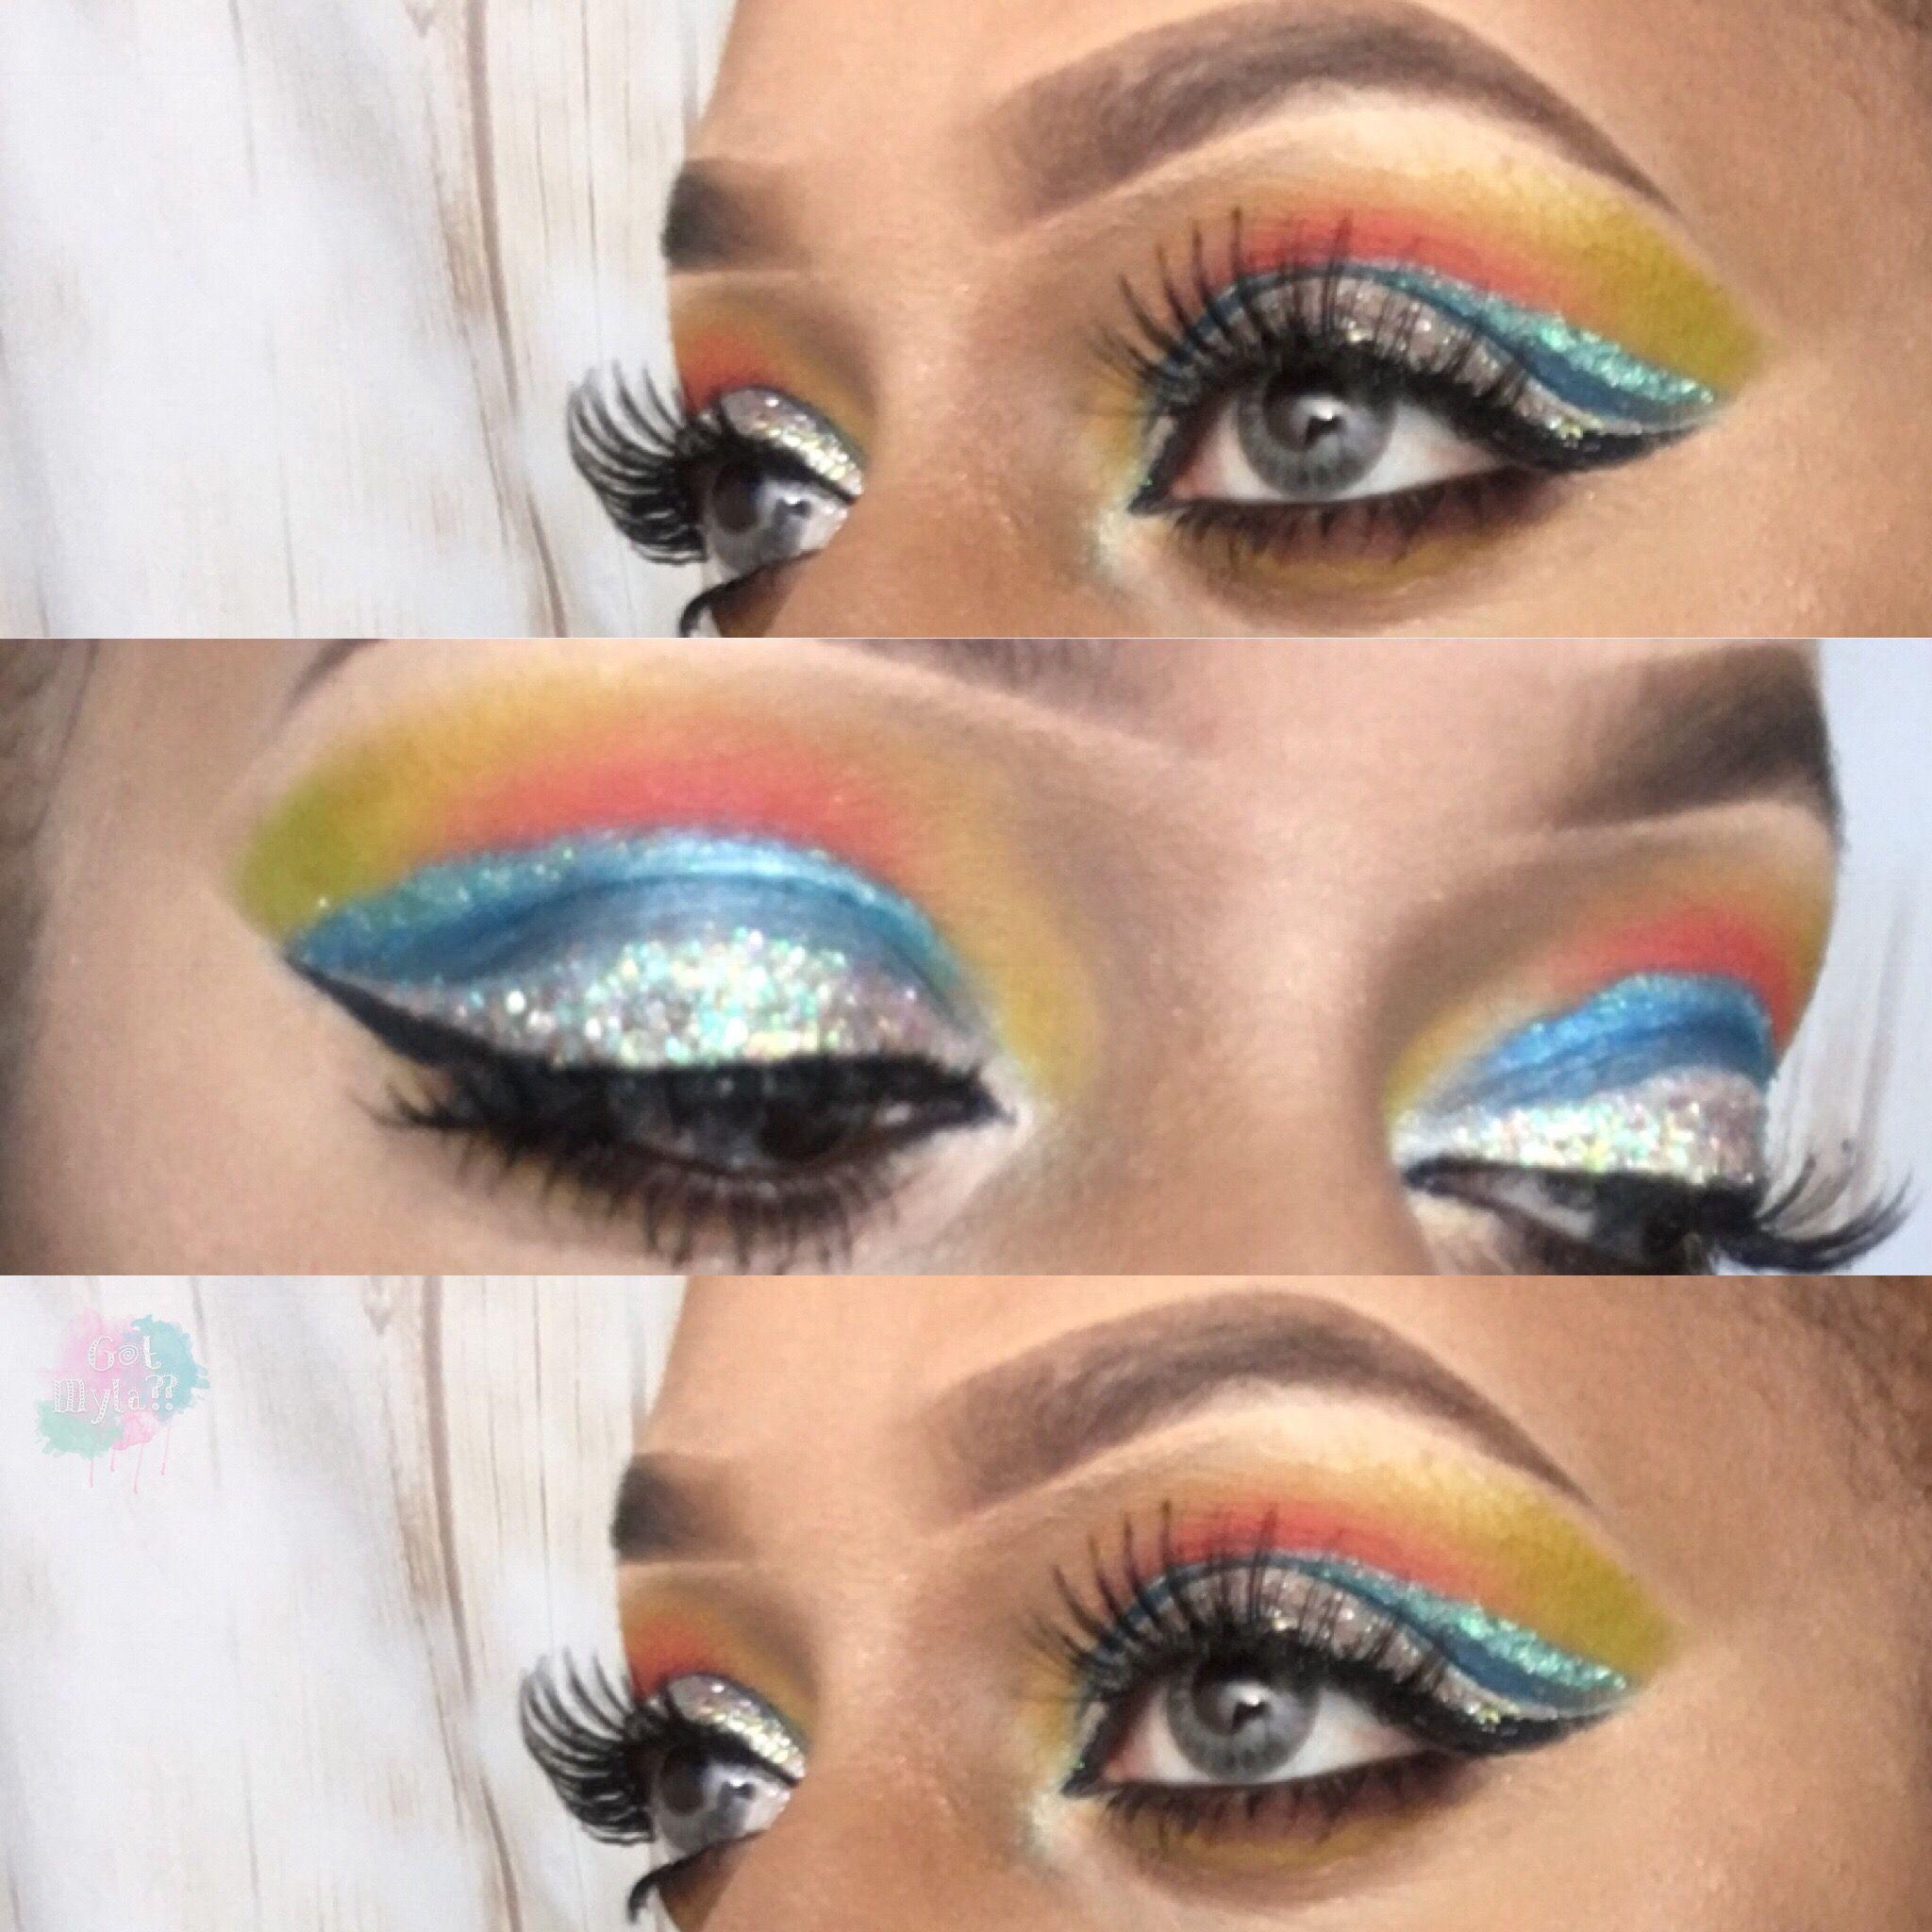 Pin by Gotmyla on Eye makeup Makeup for older women, Eye